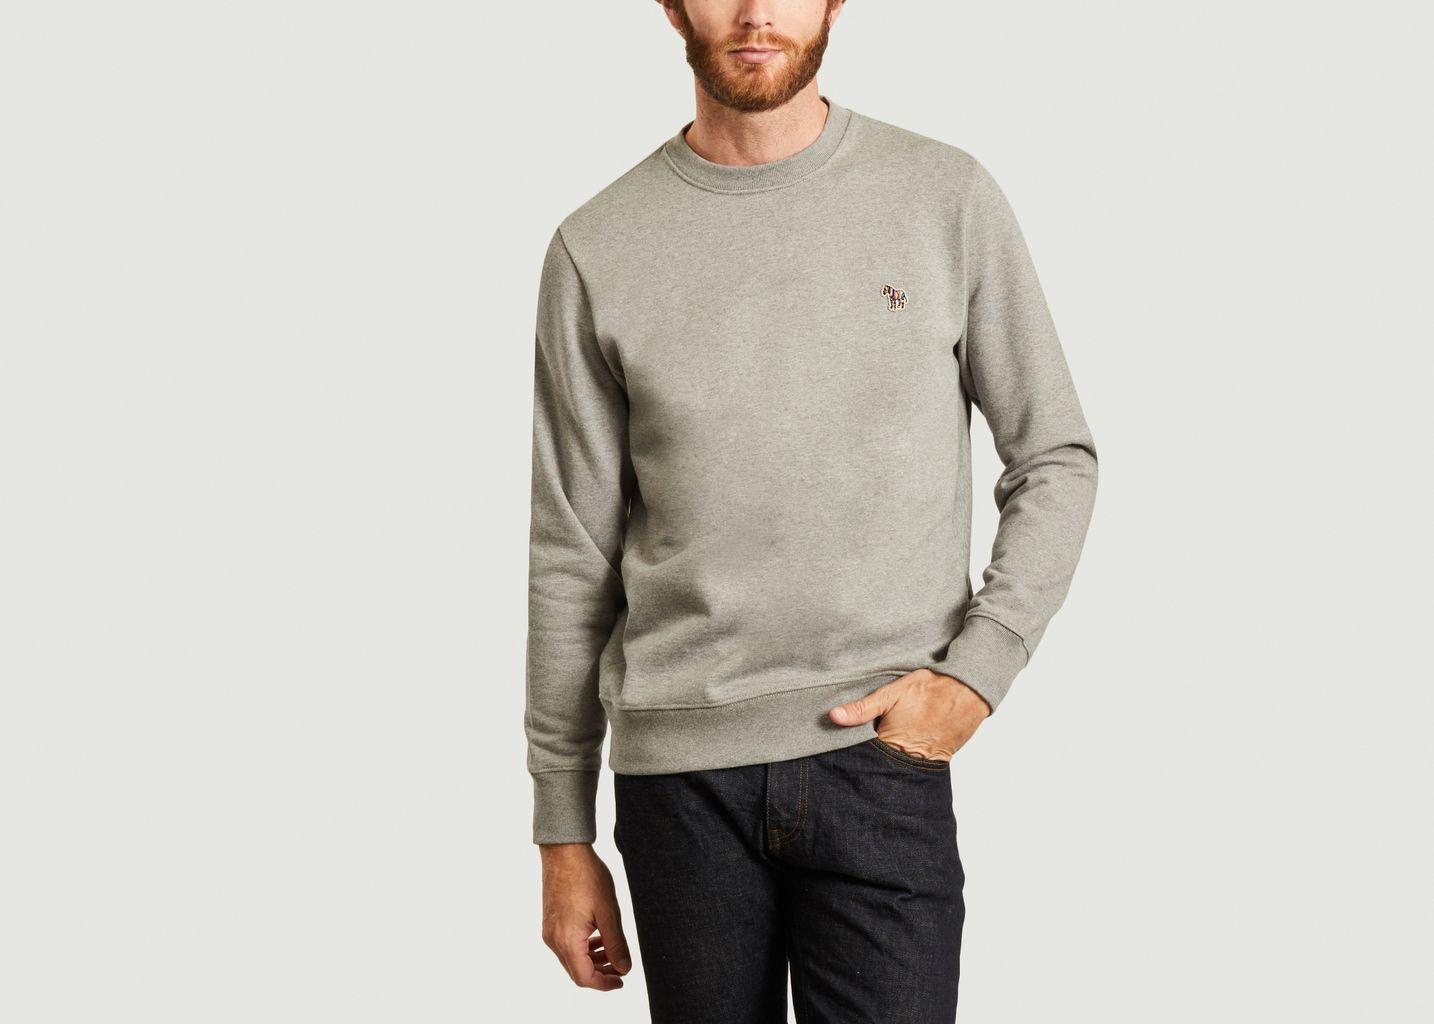 Sweatshirt Zebre - PS by PAUL SMITH